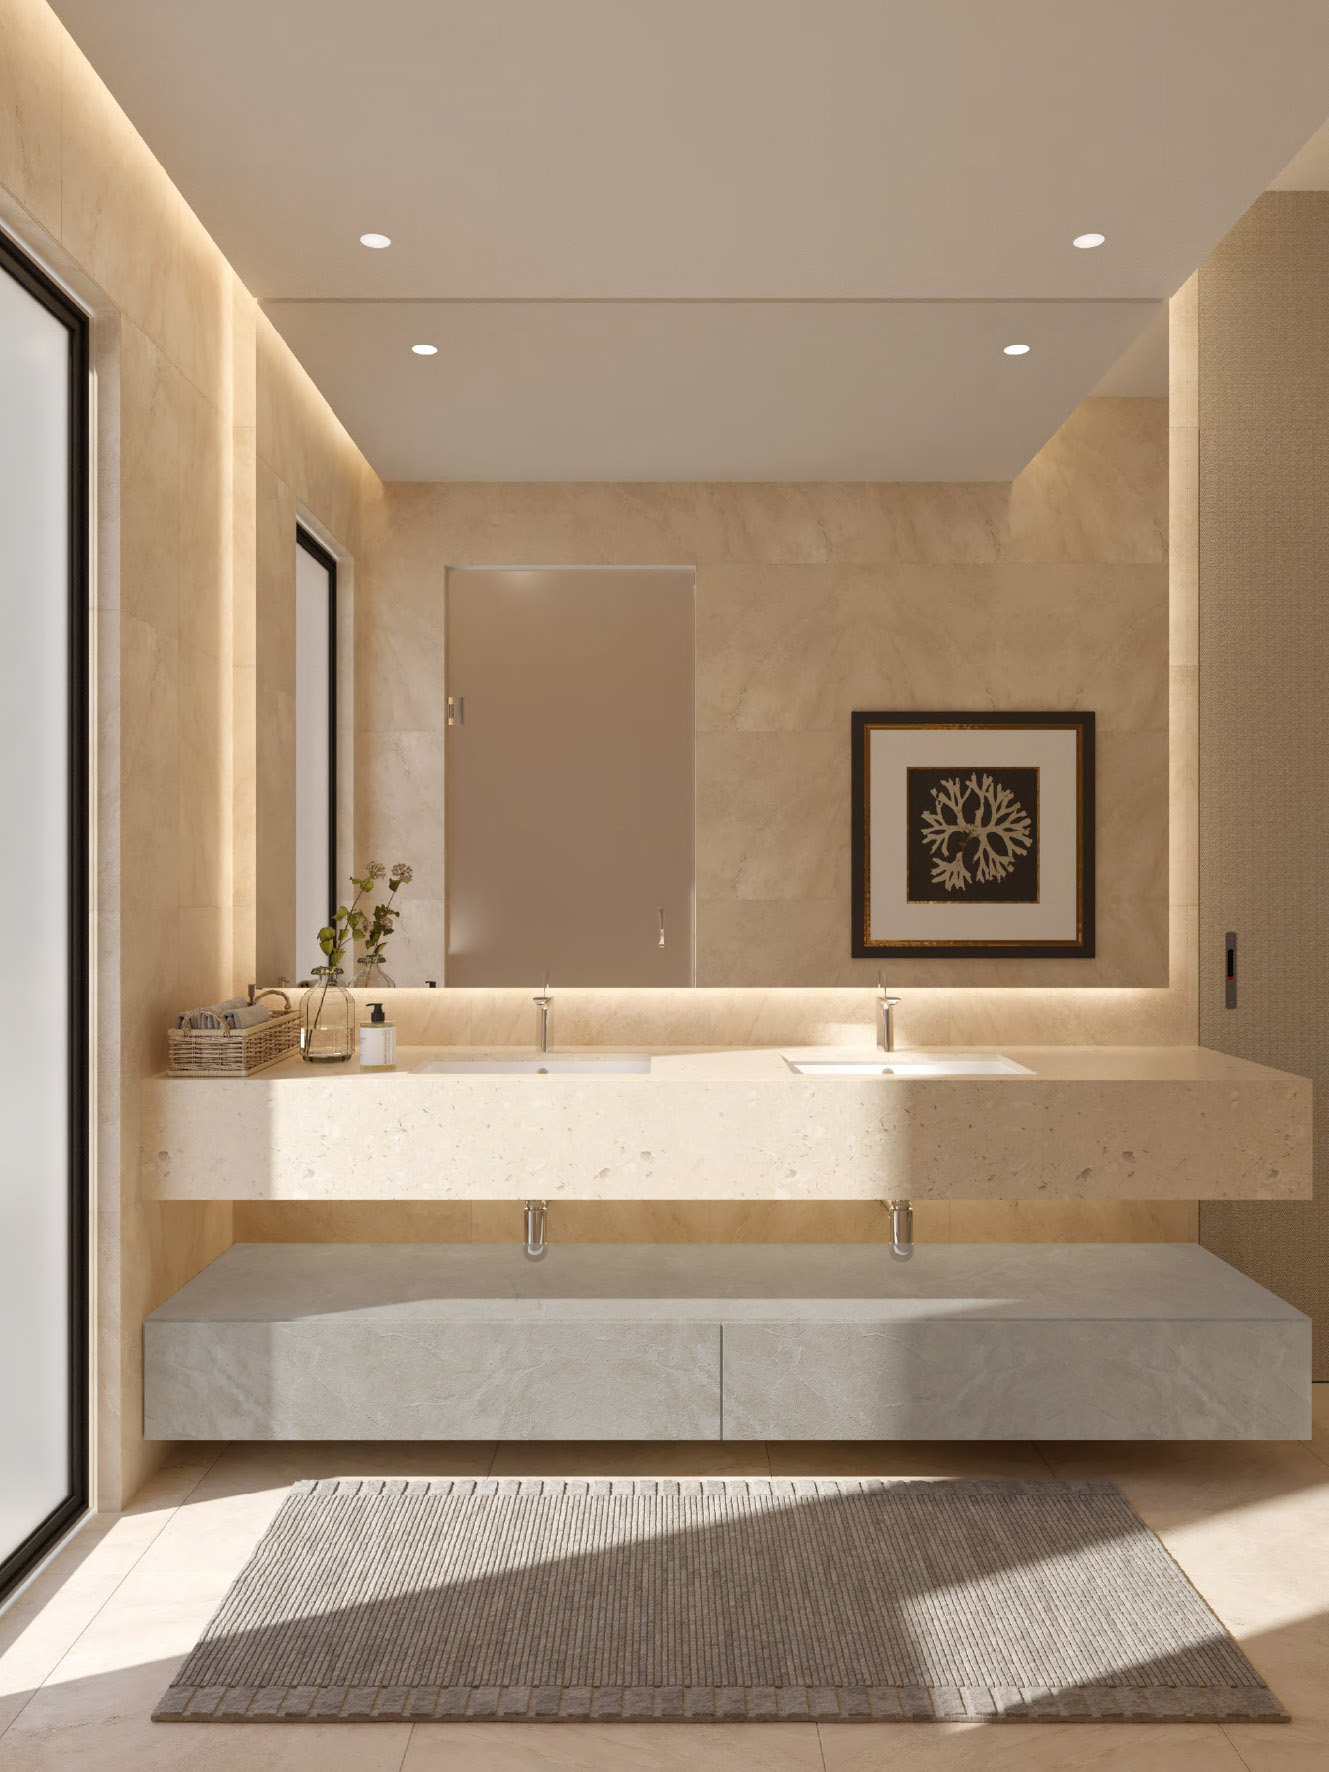 LV306 Bath 3